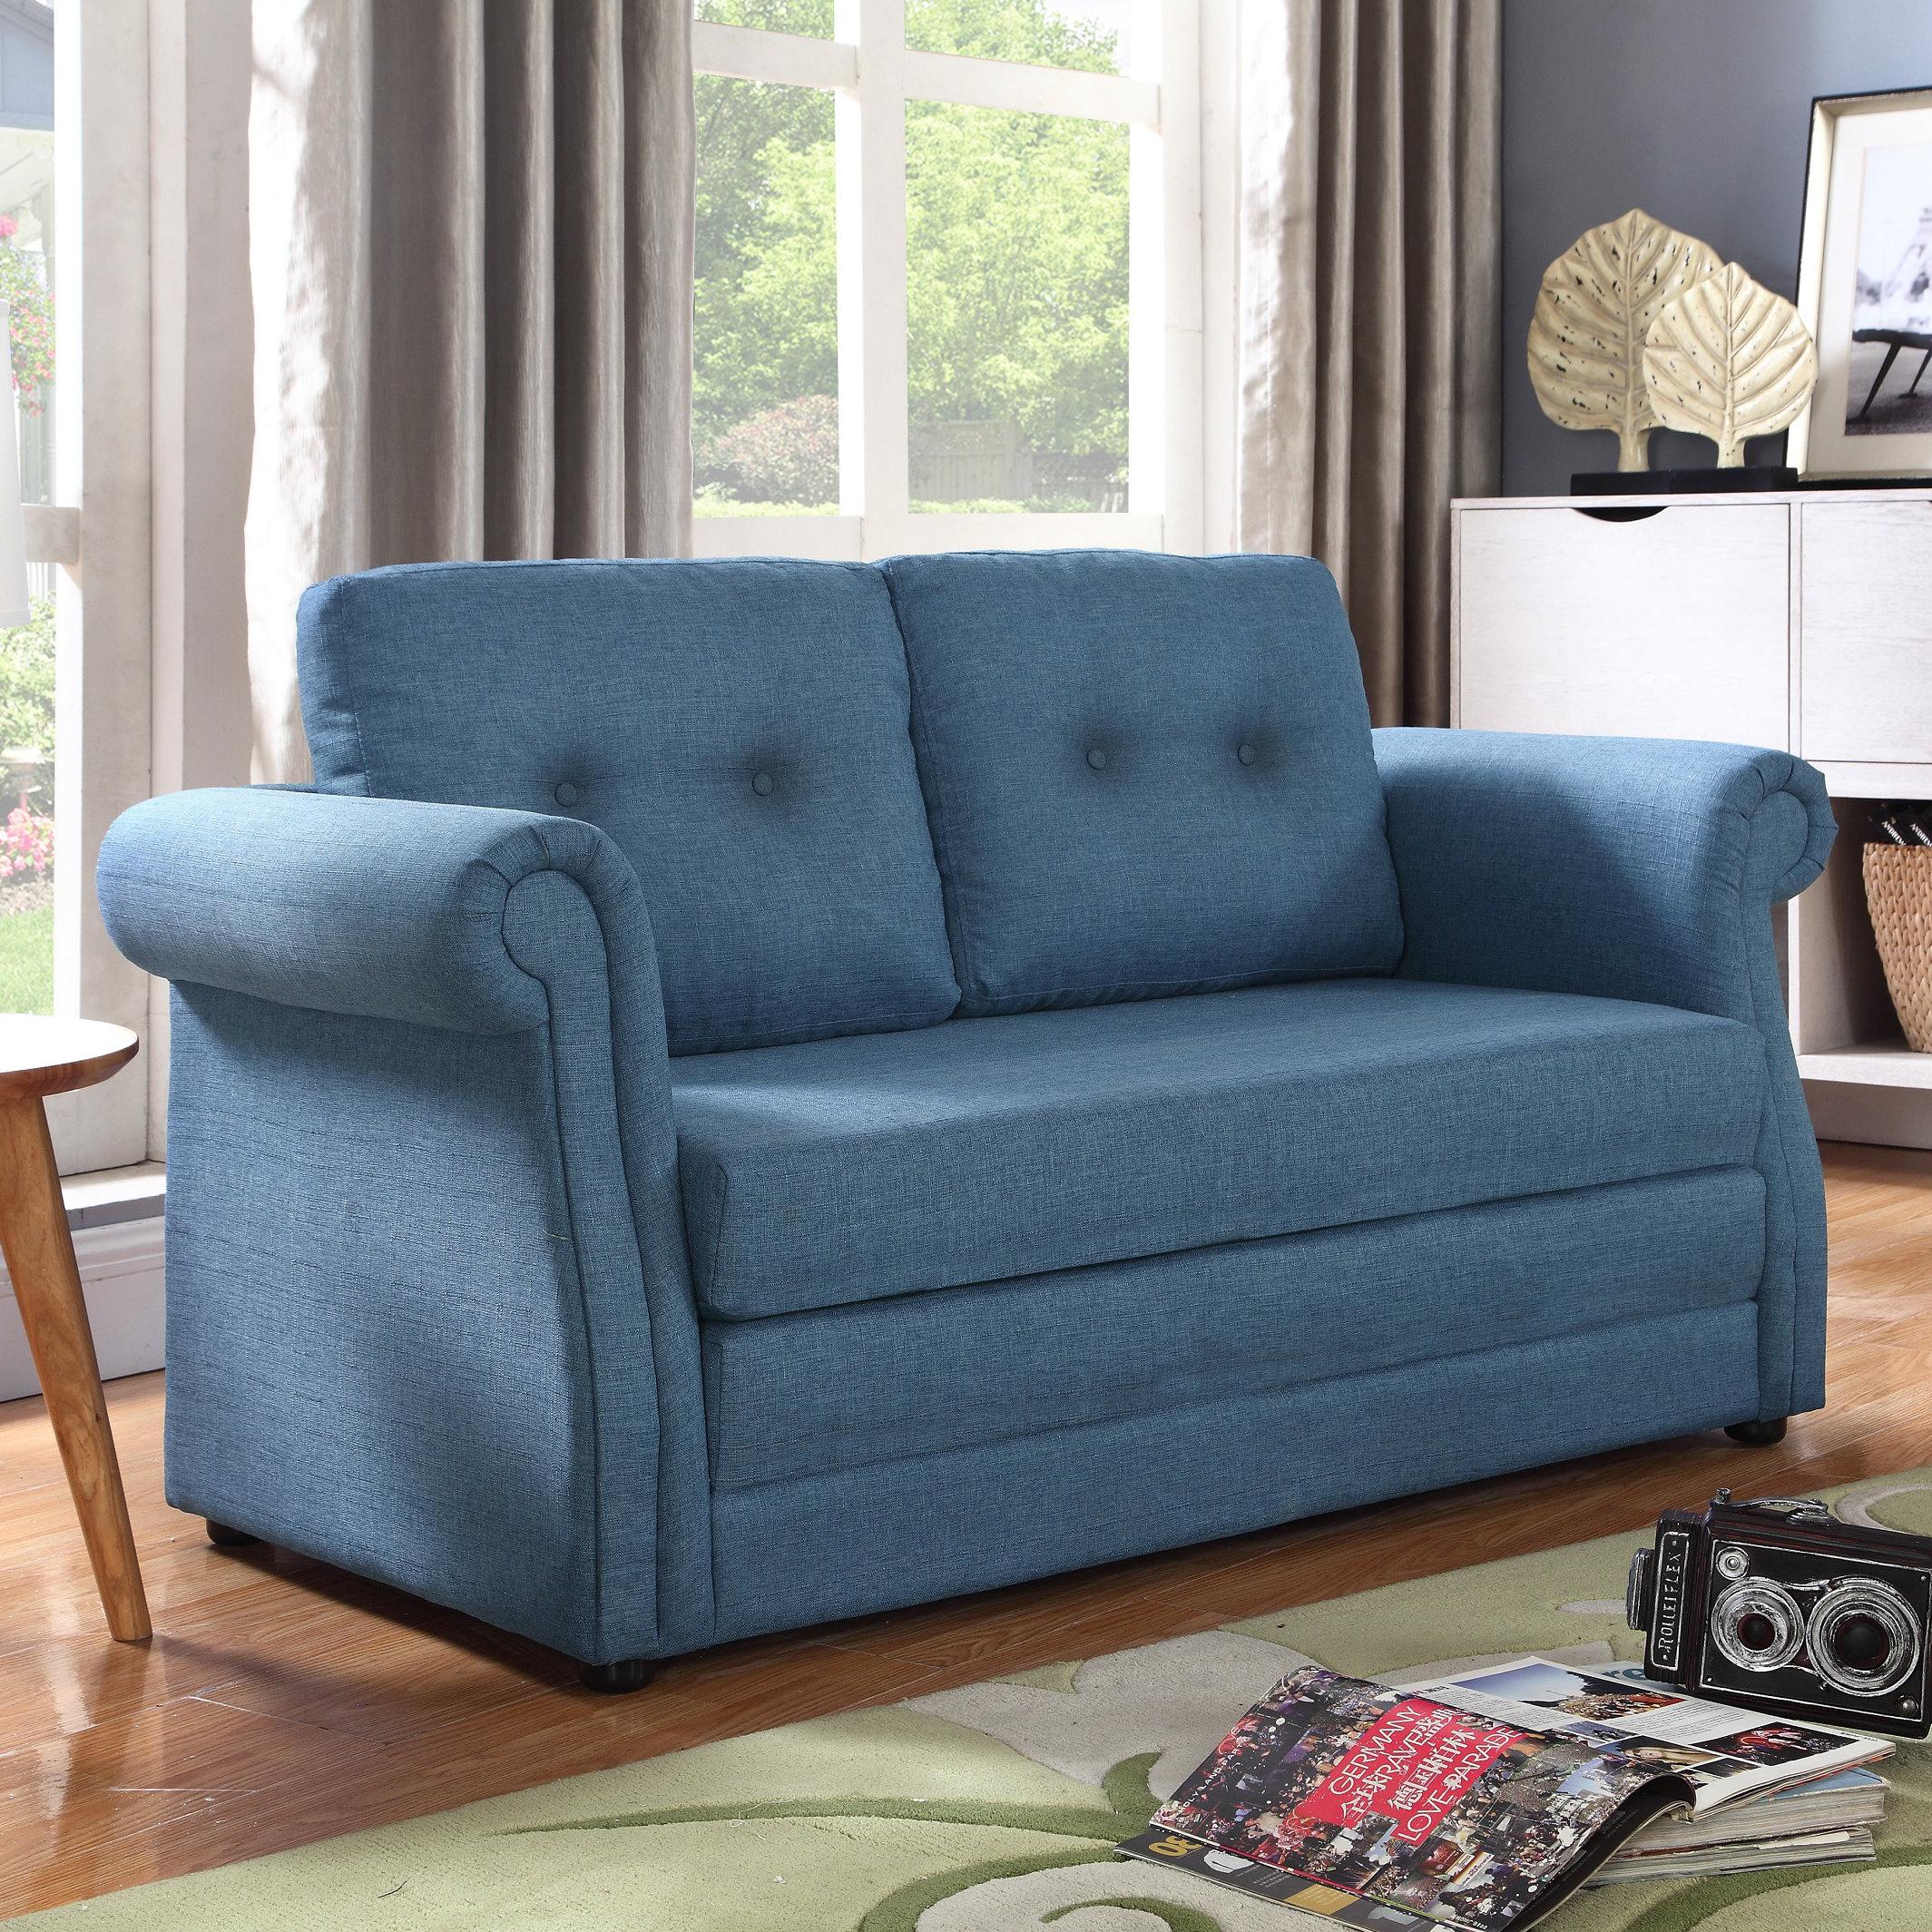 Container Sleeper Sofa U0026 Reviews | Wayfair